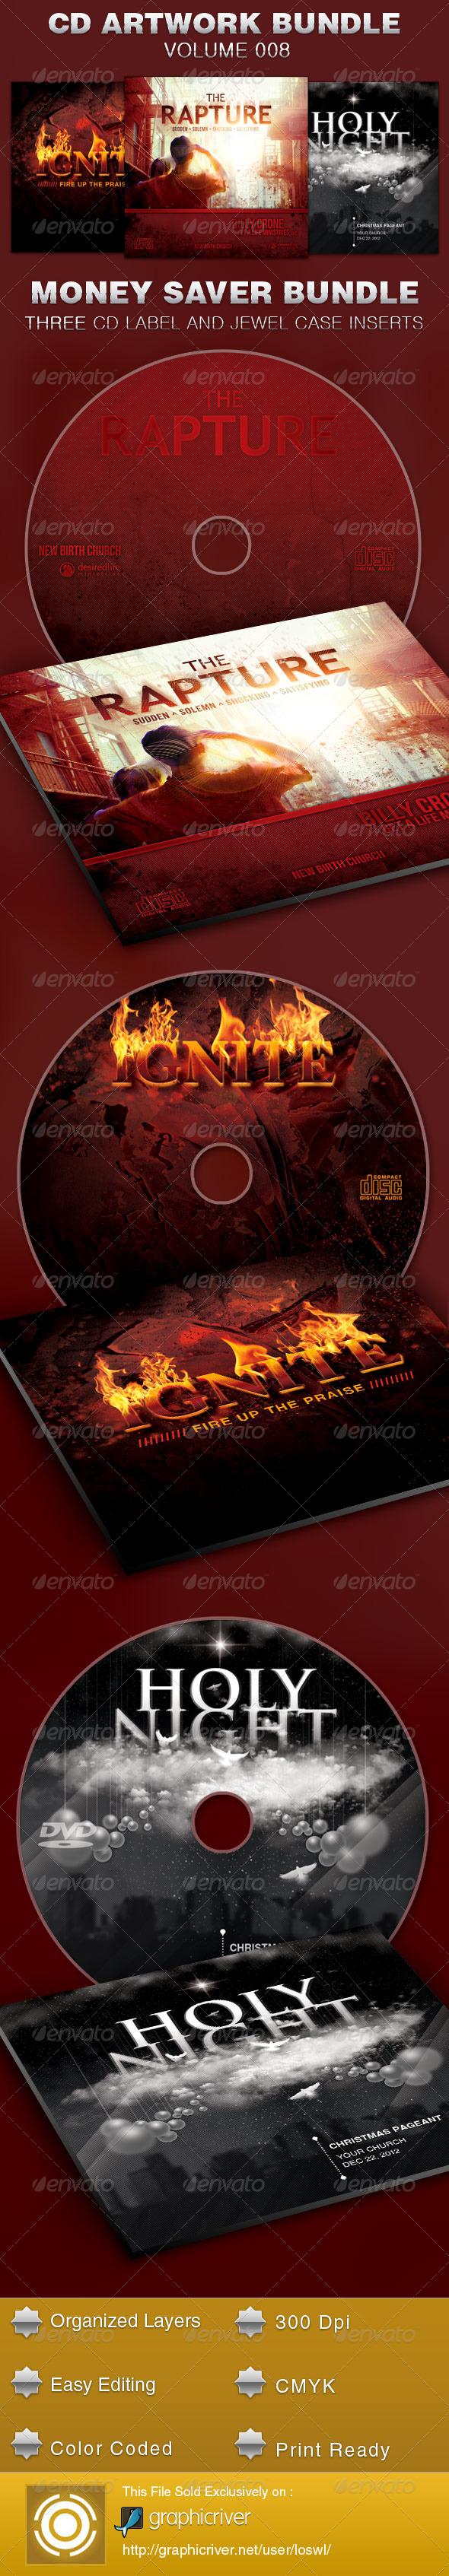 CD Cover Artwork Template Bundle-Vol 008 - CD & DVD Artwork Print Templates